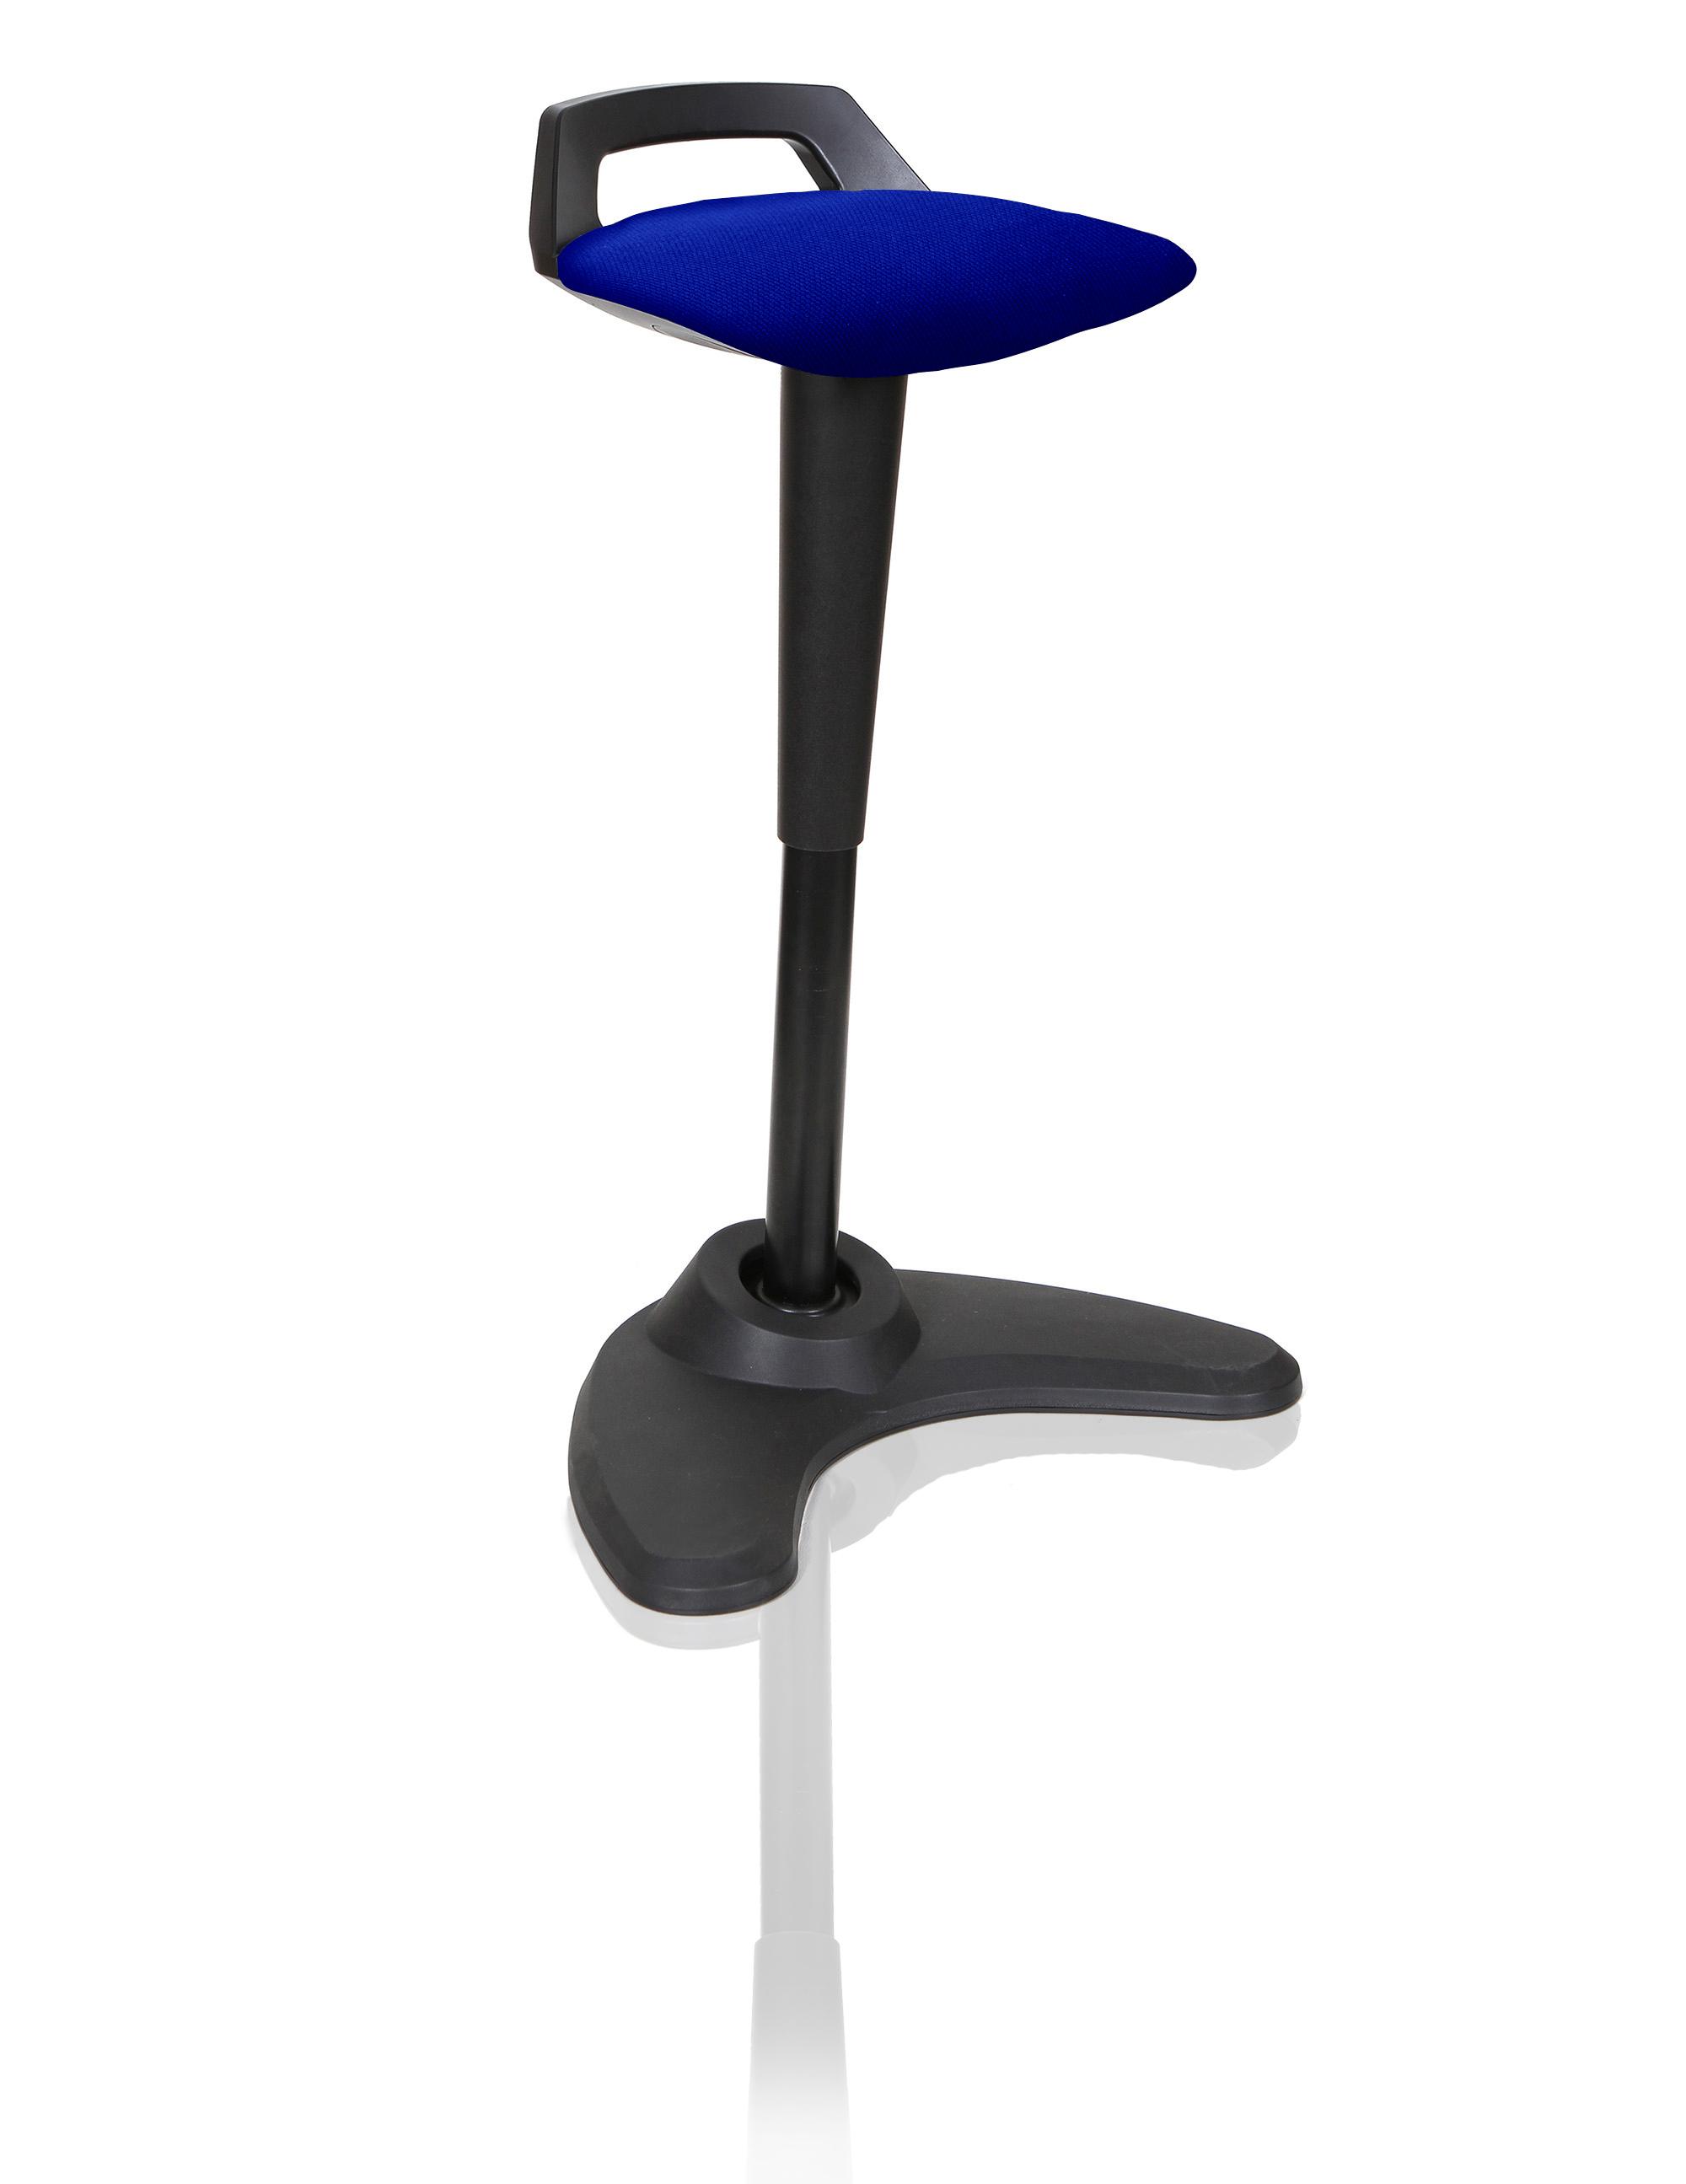 Spry Stool Black Frame Bespoke Seat Stevia Blue KCUP1207